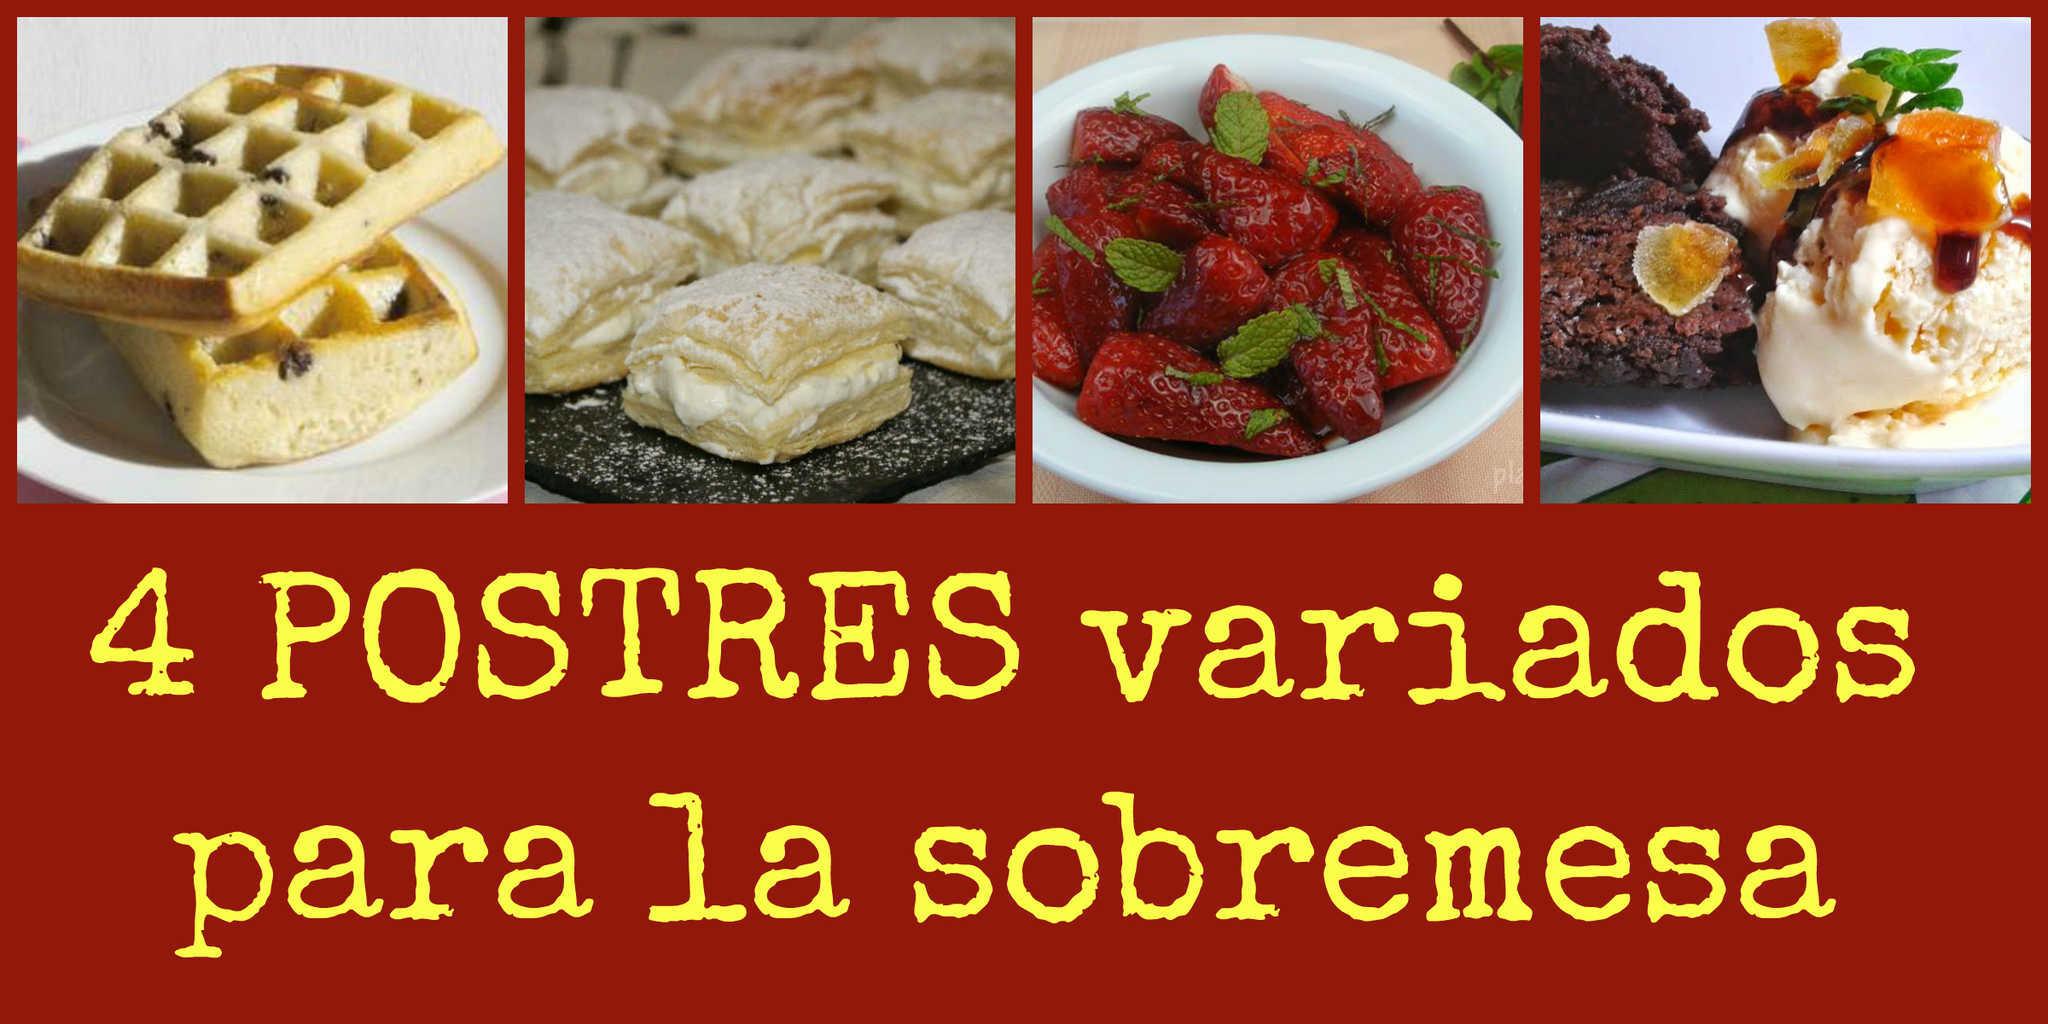 4 Postres variados para disfrutar de la sobremesa